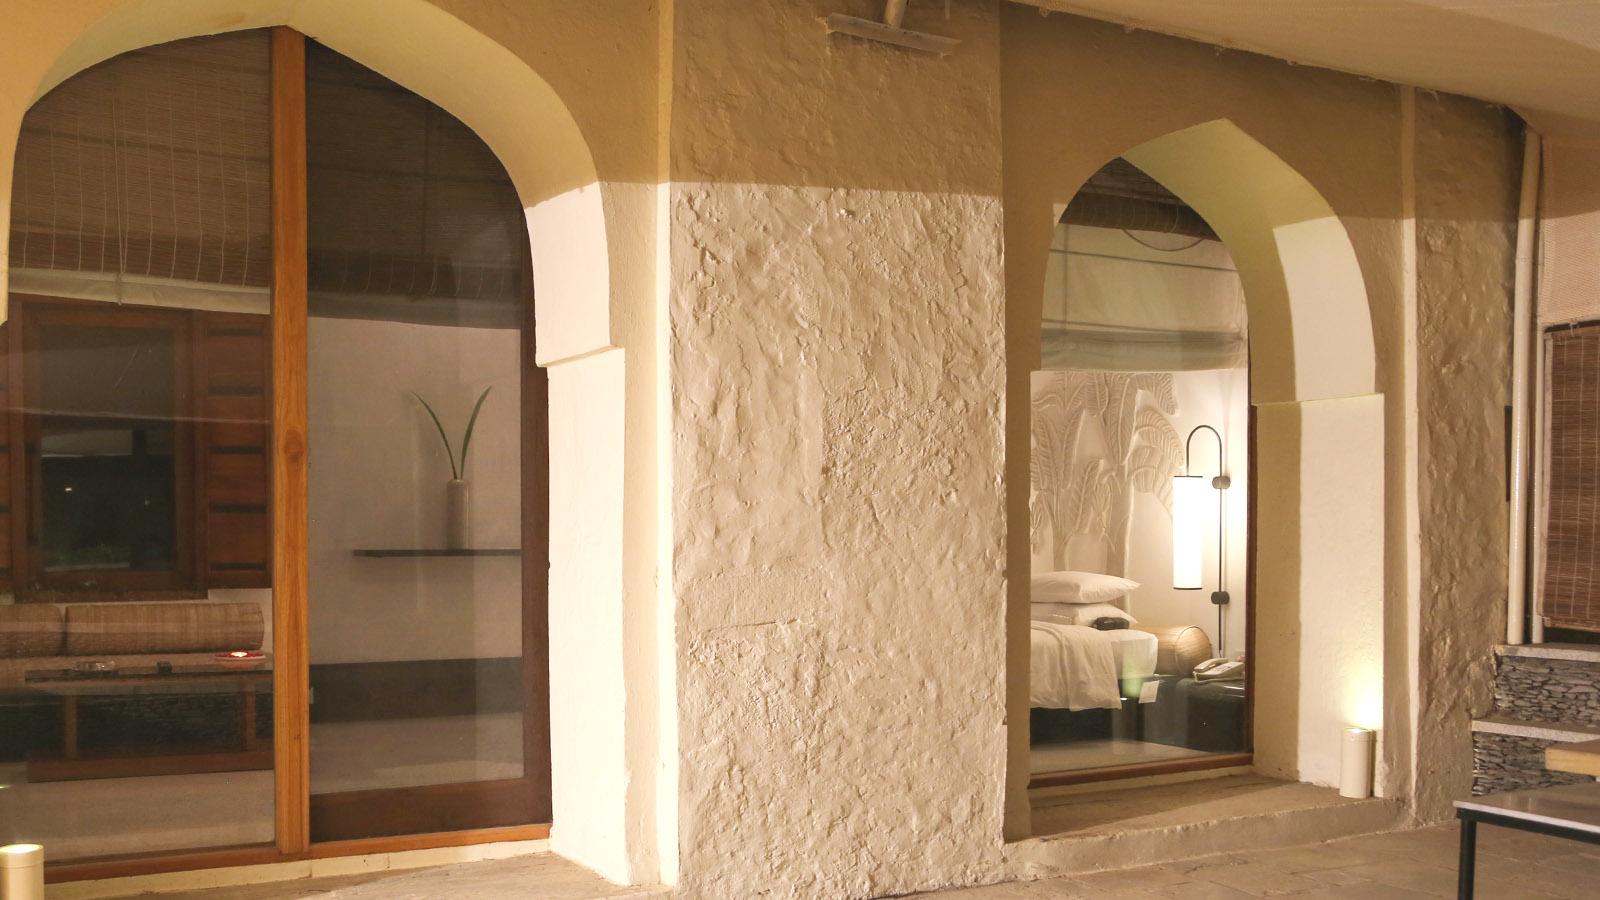 Garden-Suite-RAAS-Hotel-devigarh-Rajasthan-03